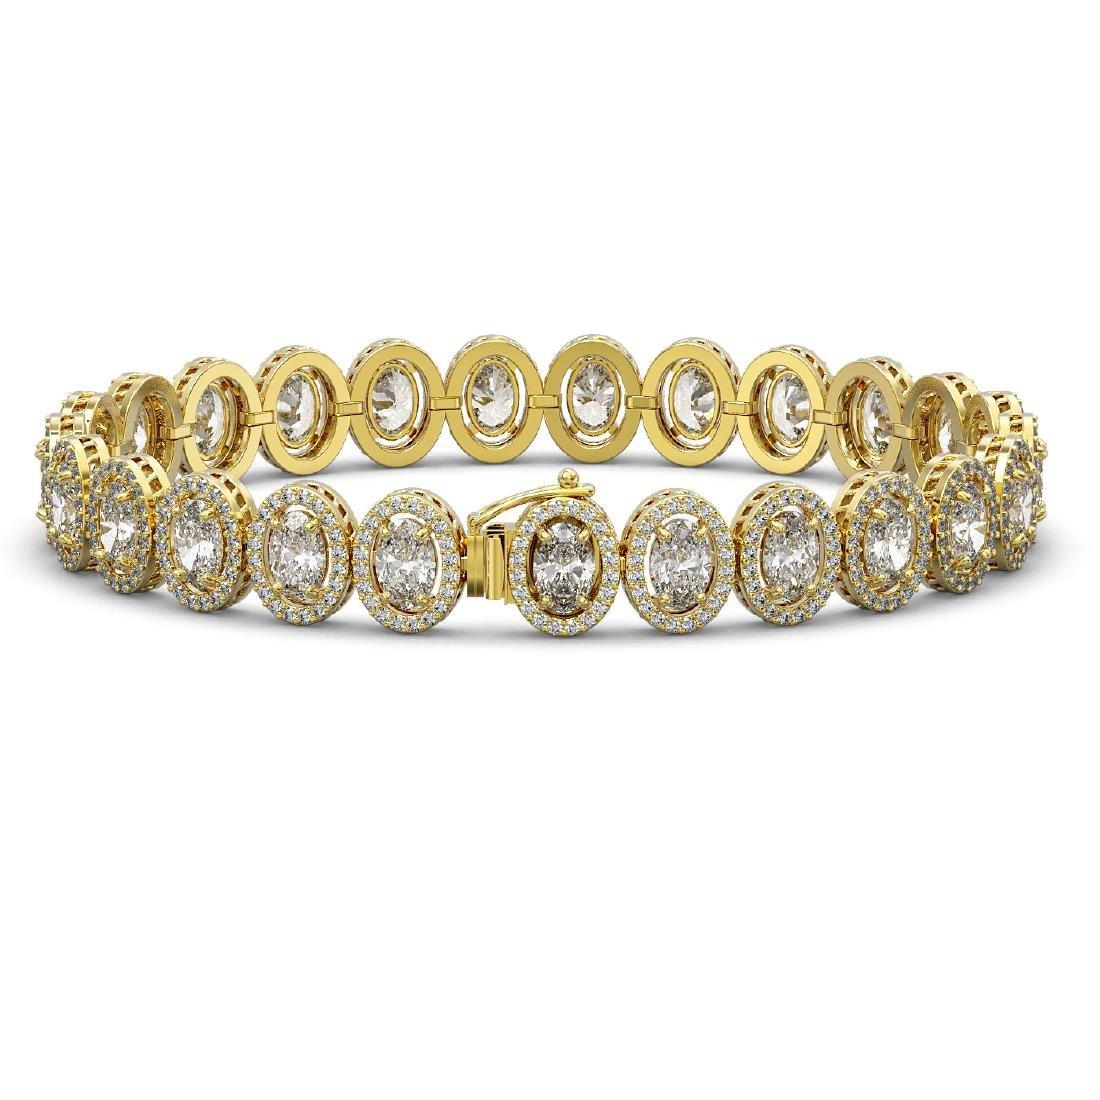 15.8 CTW Oval Diamond Designer Bracelet 18K Yellow Gold - 2